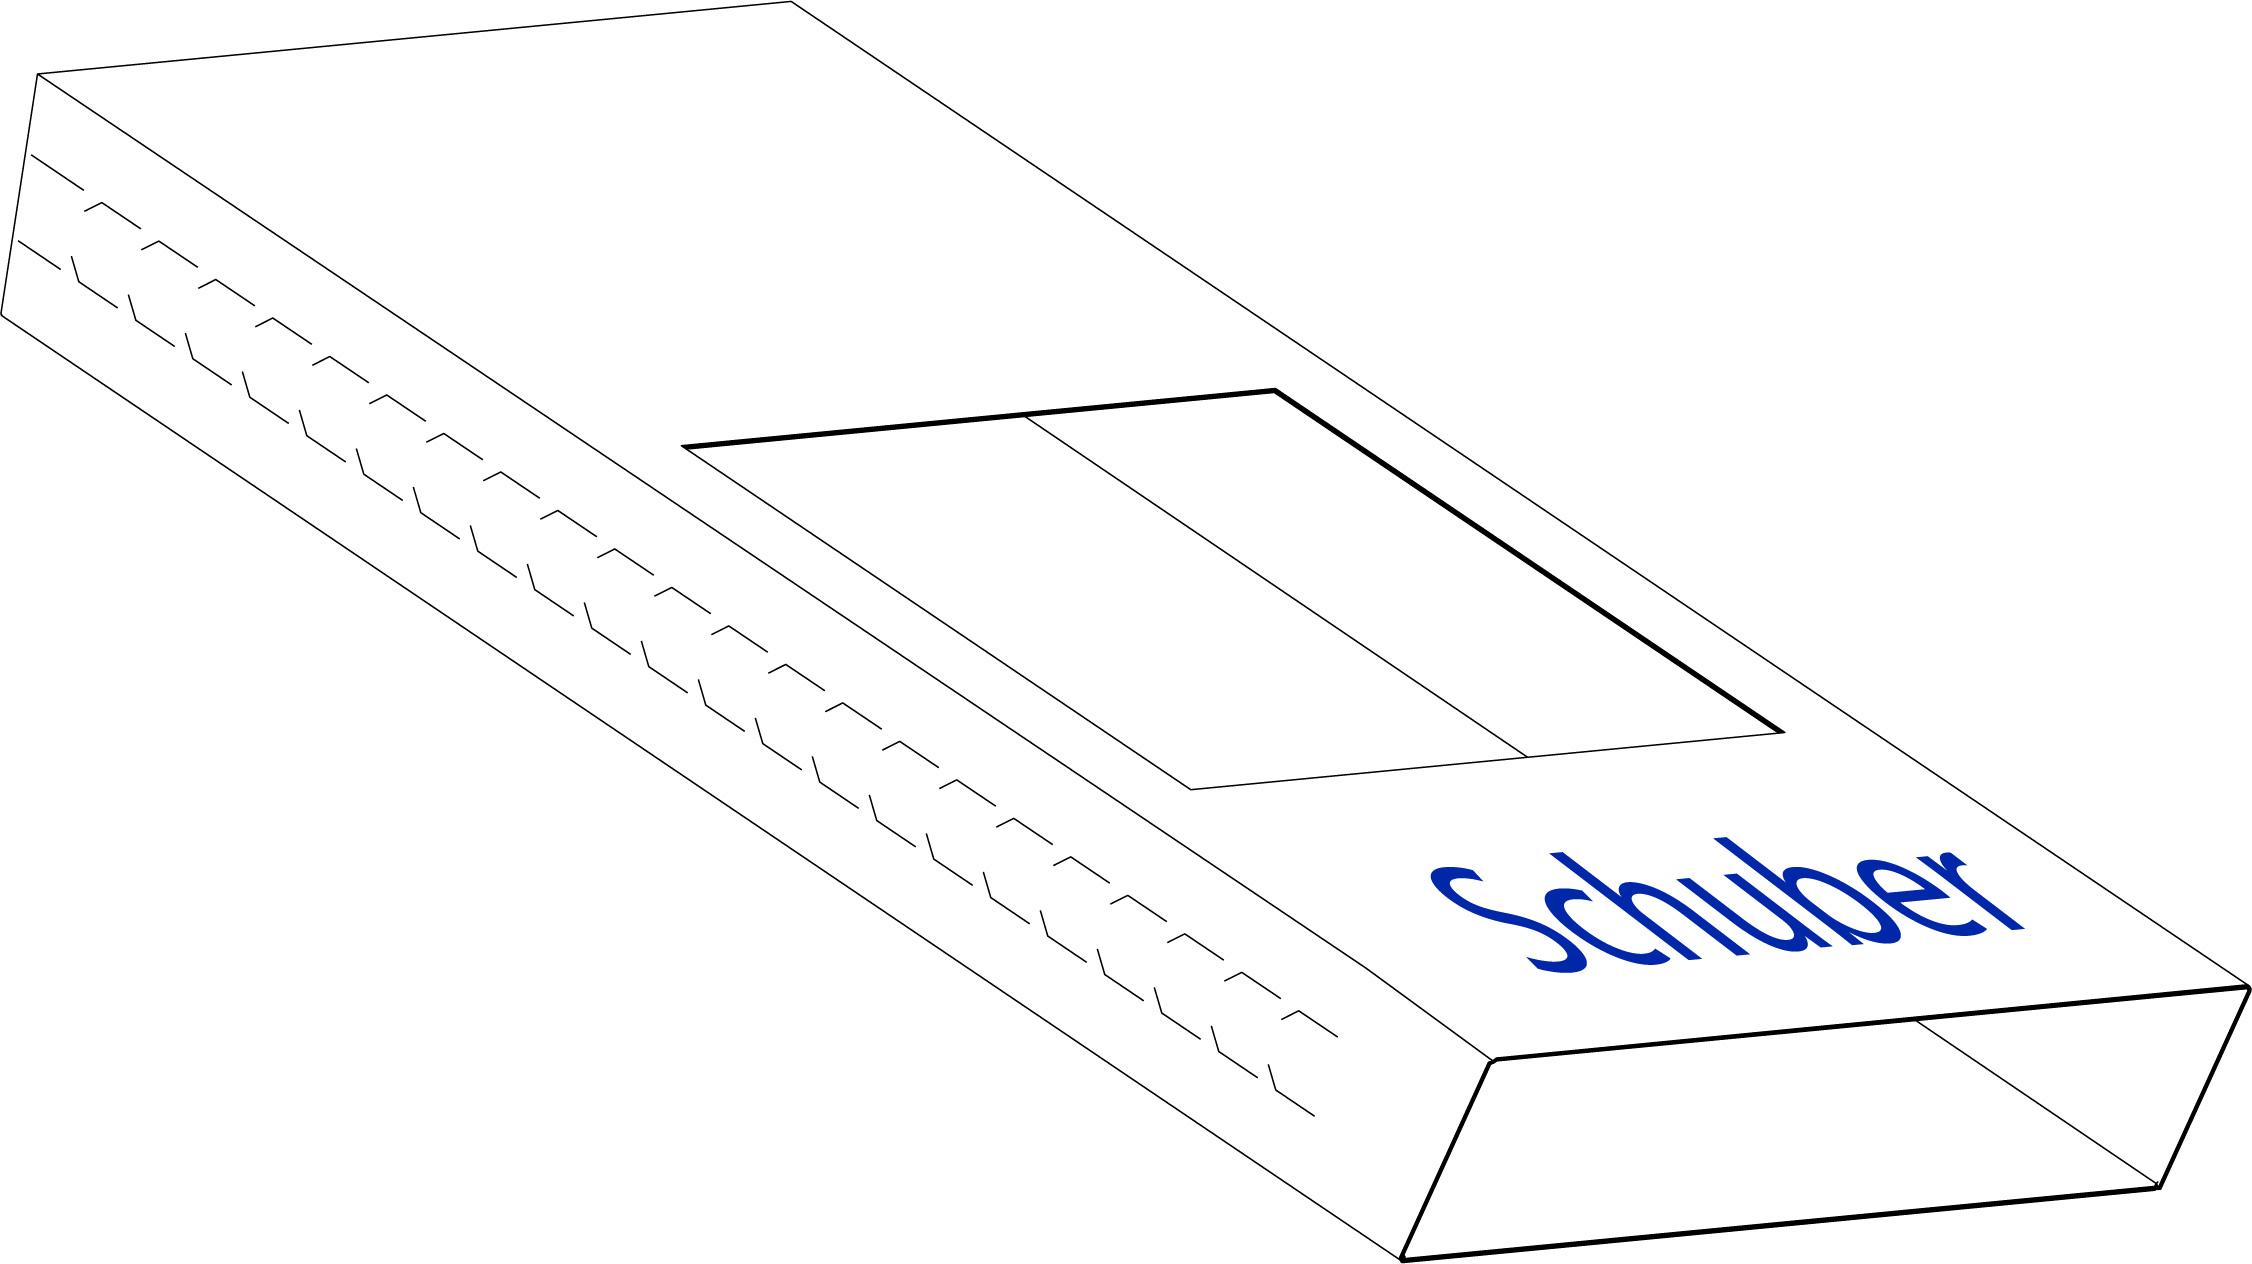 Schuber Backen 2_ gezeichnet+beschriftet.jpg